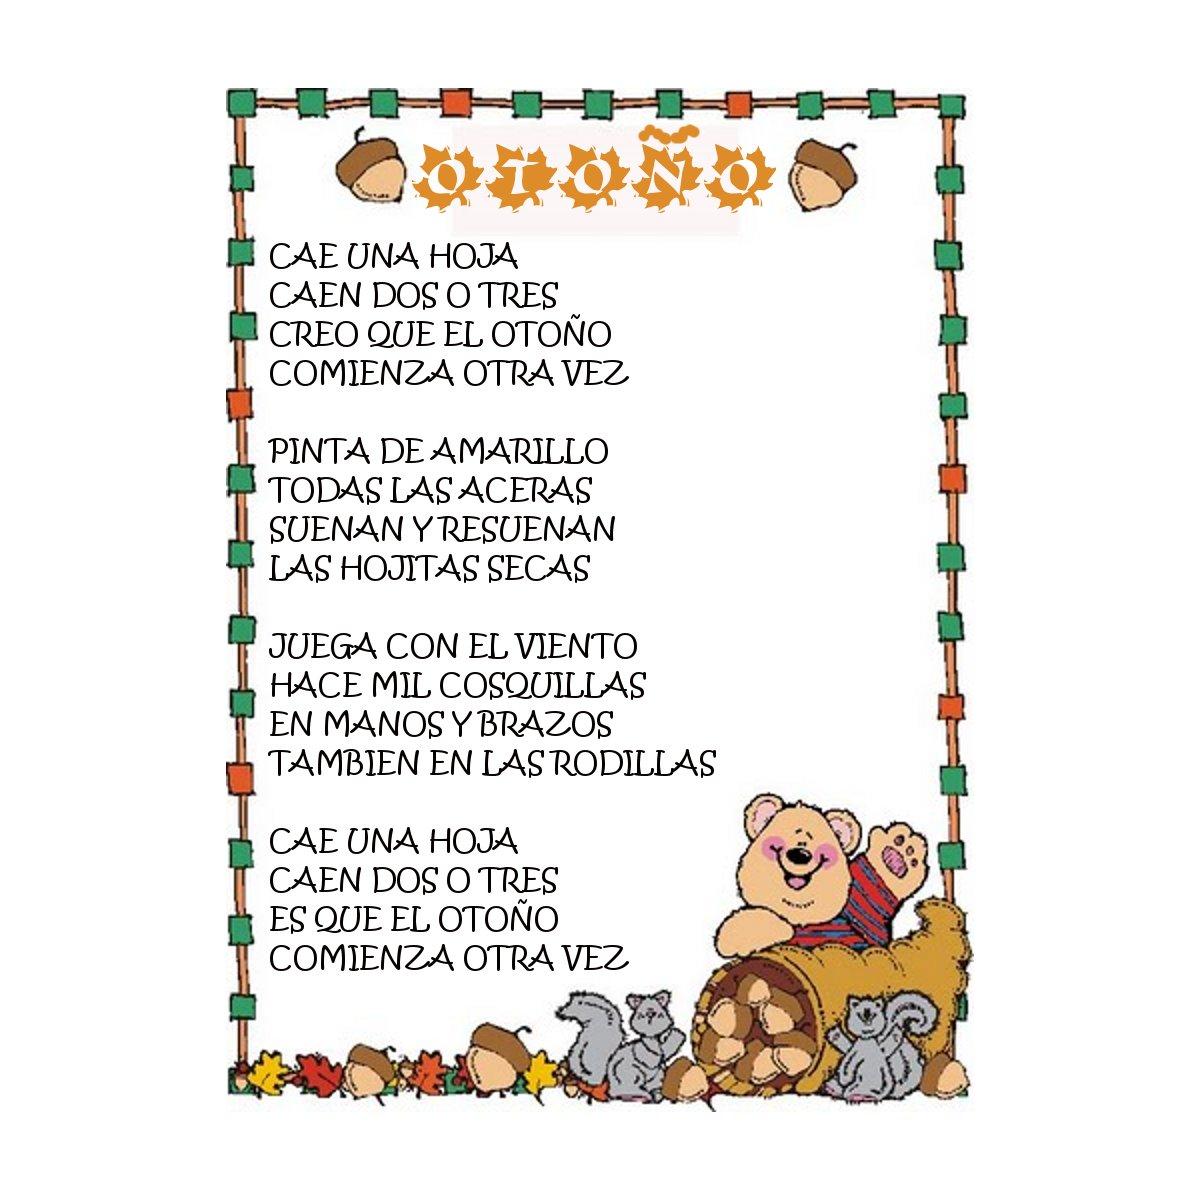 ESOS LOCOS BAJITOS DE INFANTIL MAS COSAS DE OTOO